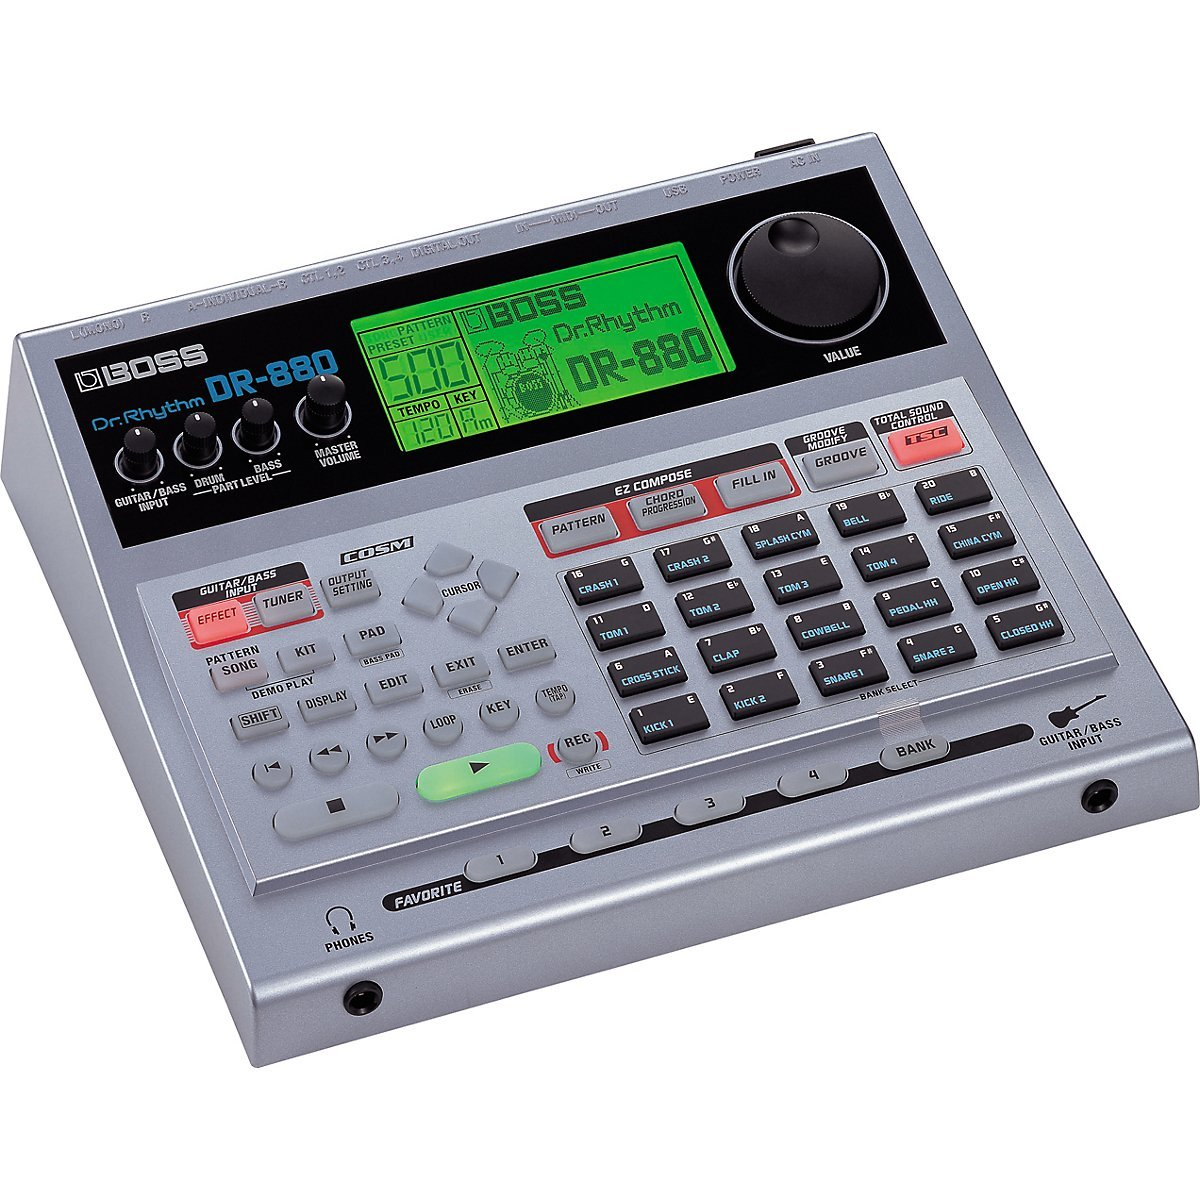 Boss DR-880 Drum Machines